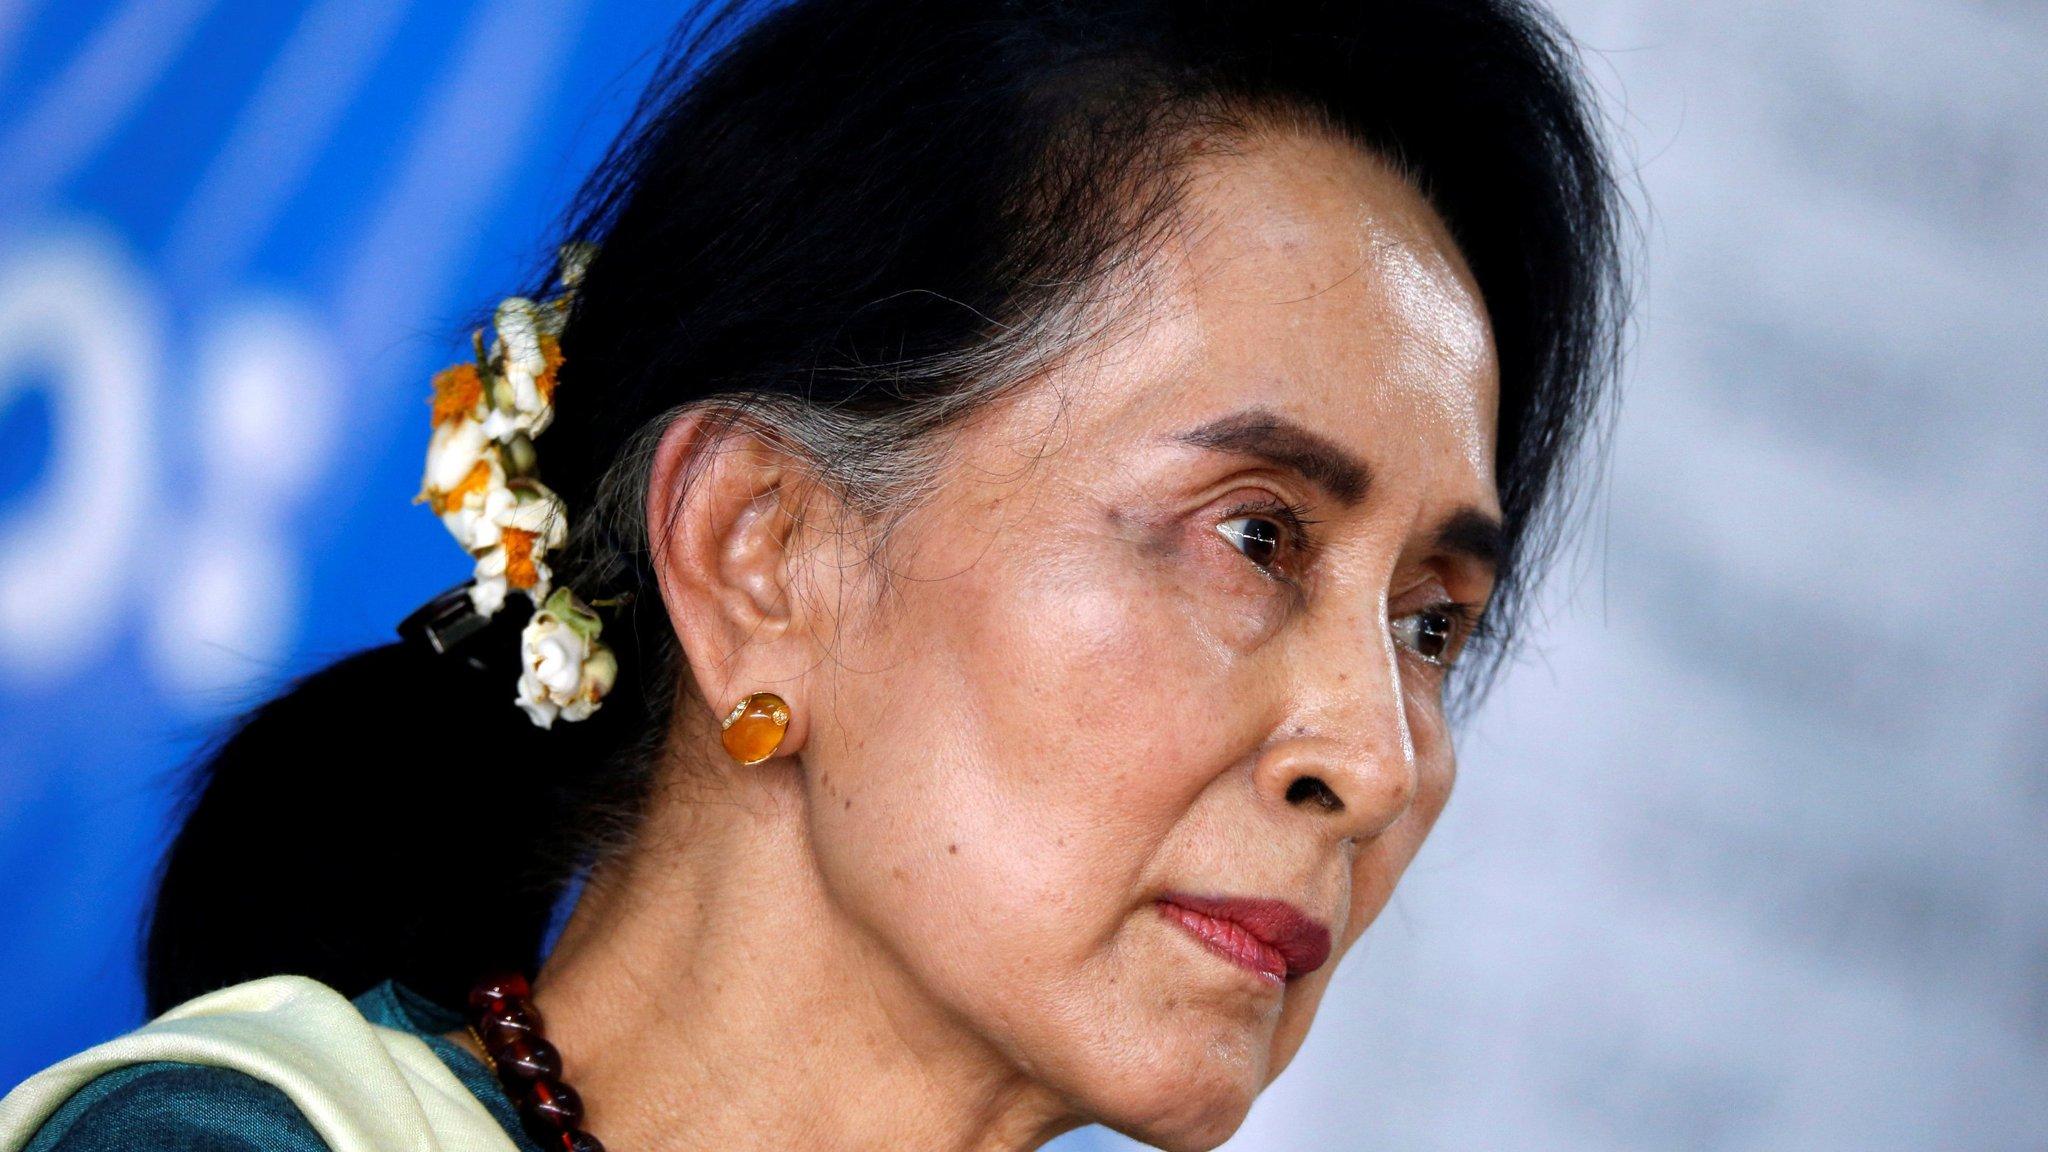 Aung San Suu Kyi rebuked by US adviser over Rohingya crisis